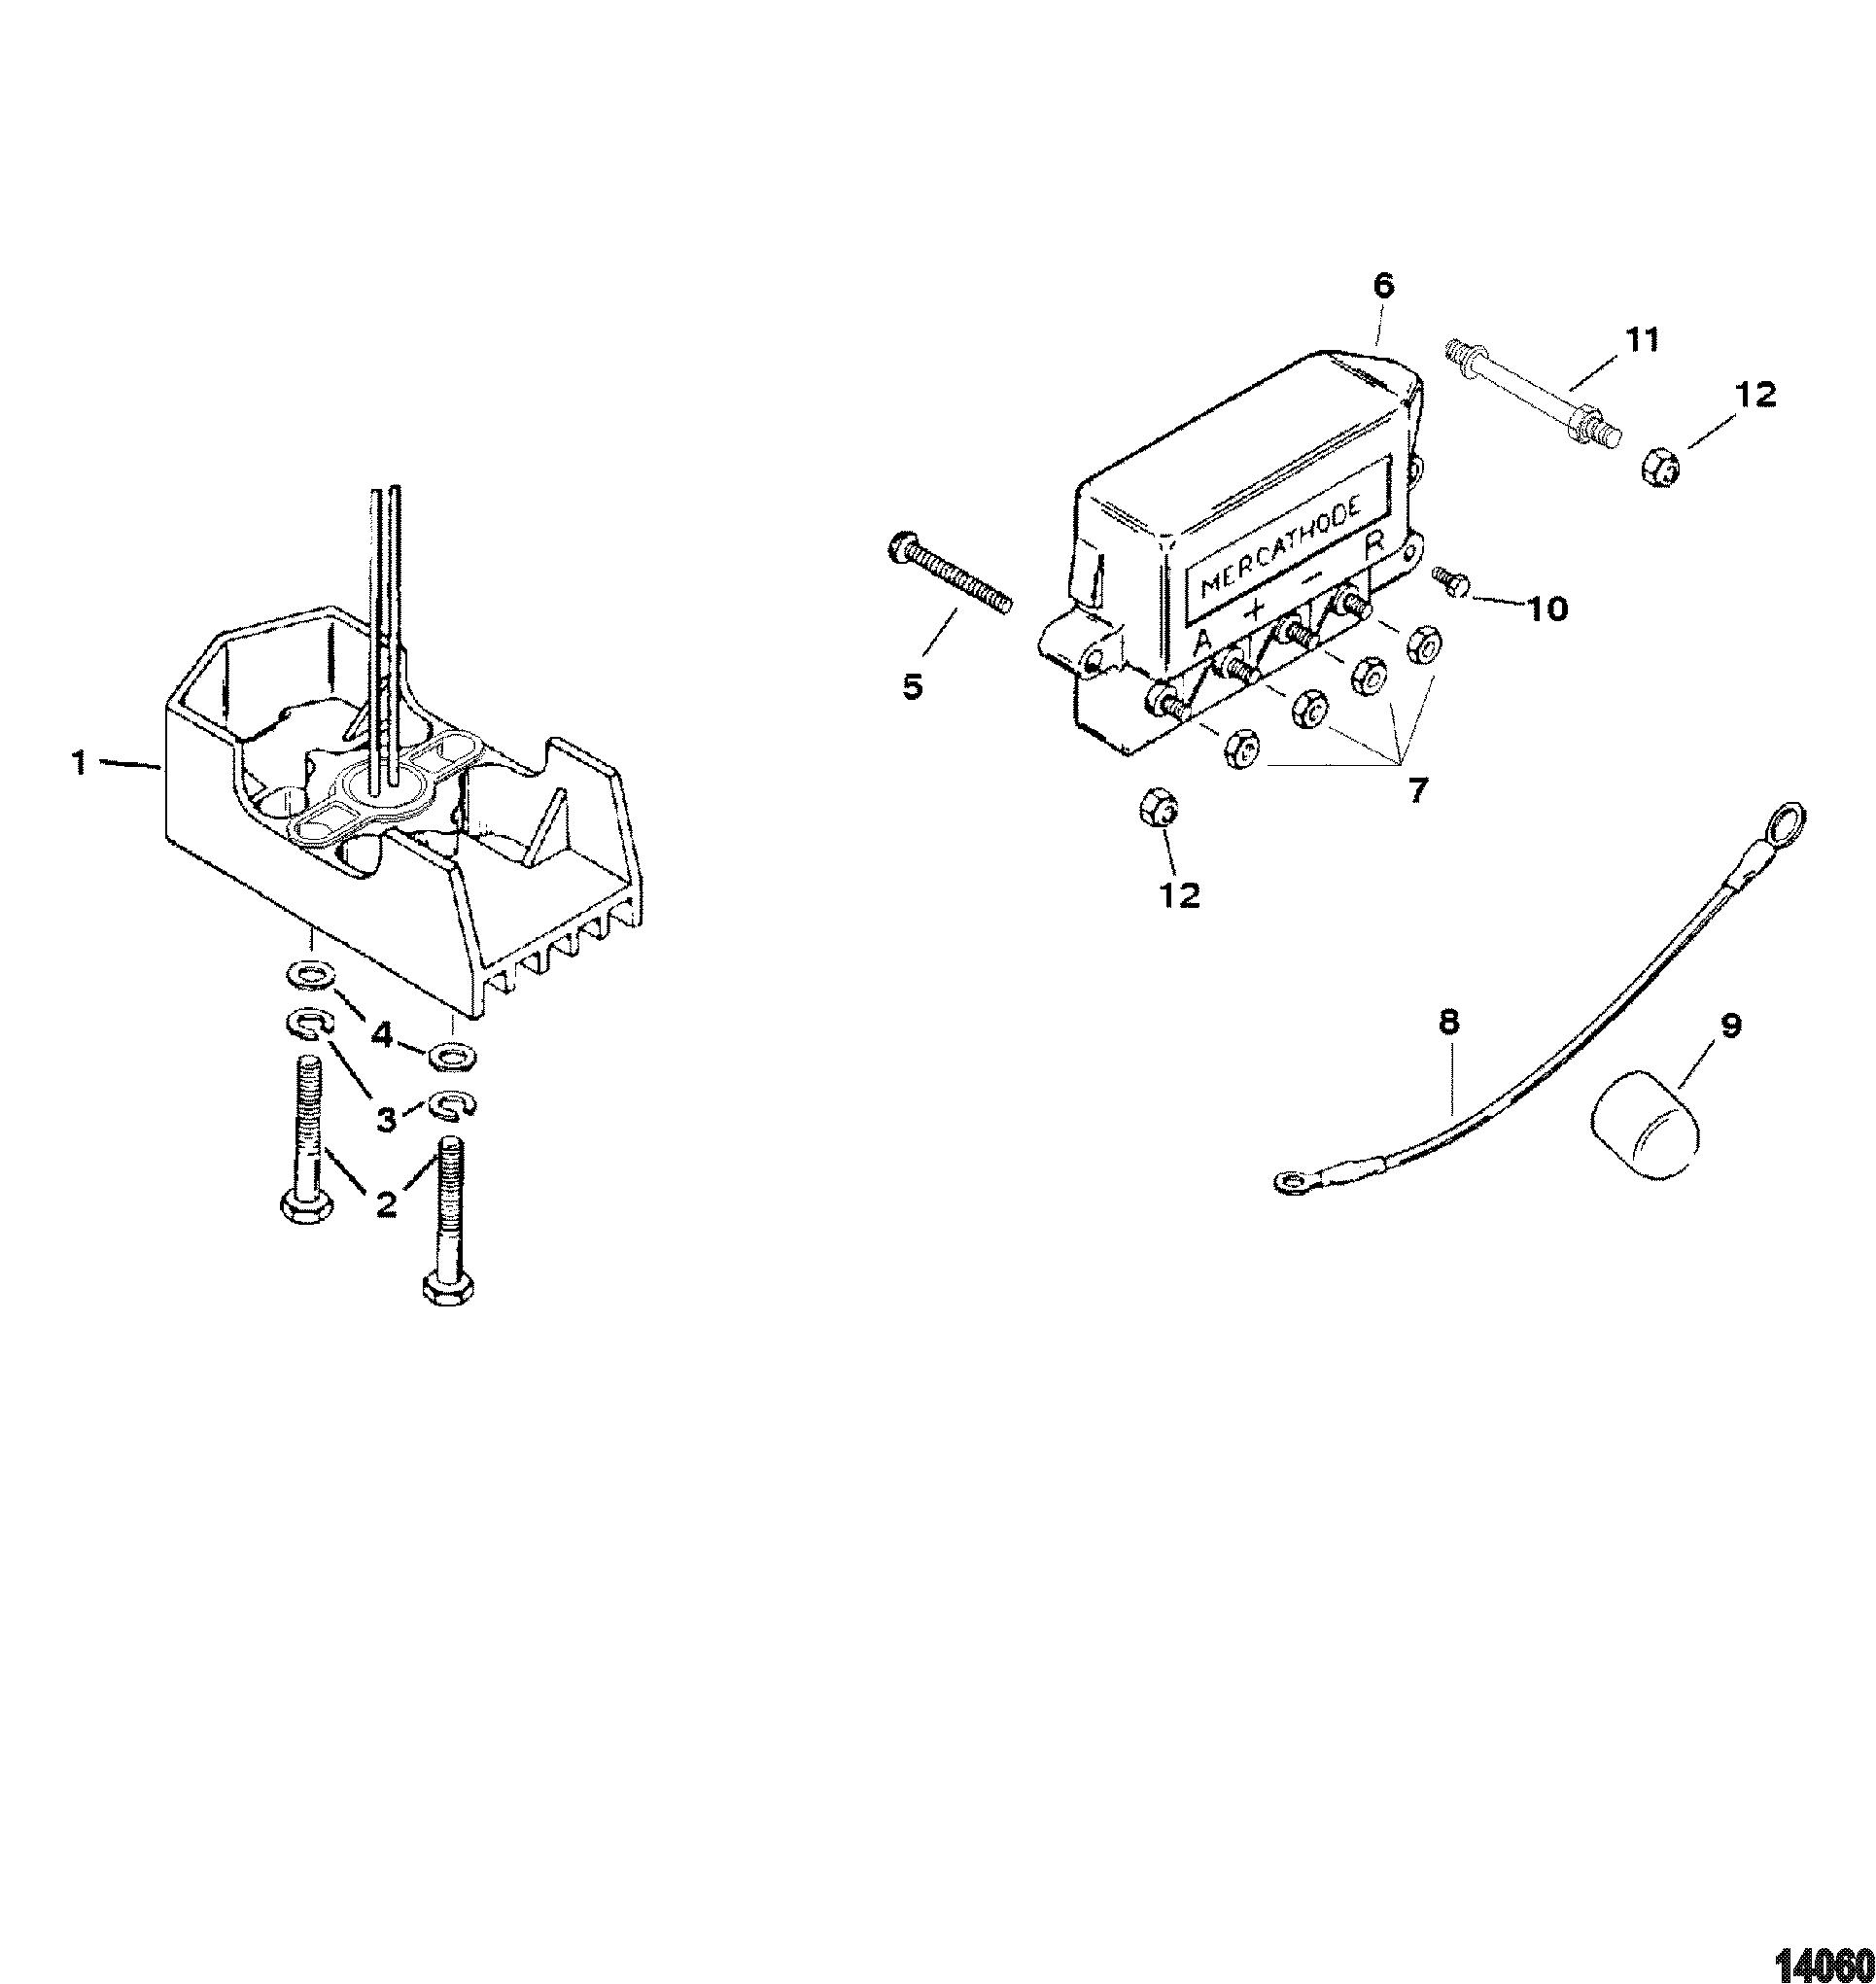 Mercathode Components FOR MERCRUISER 4.3L ALPHA/BRAVO 262